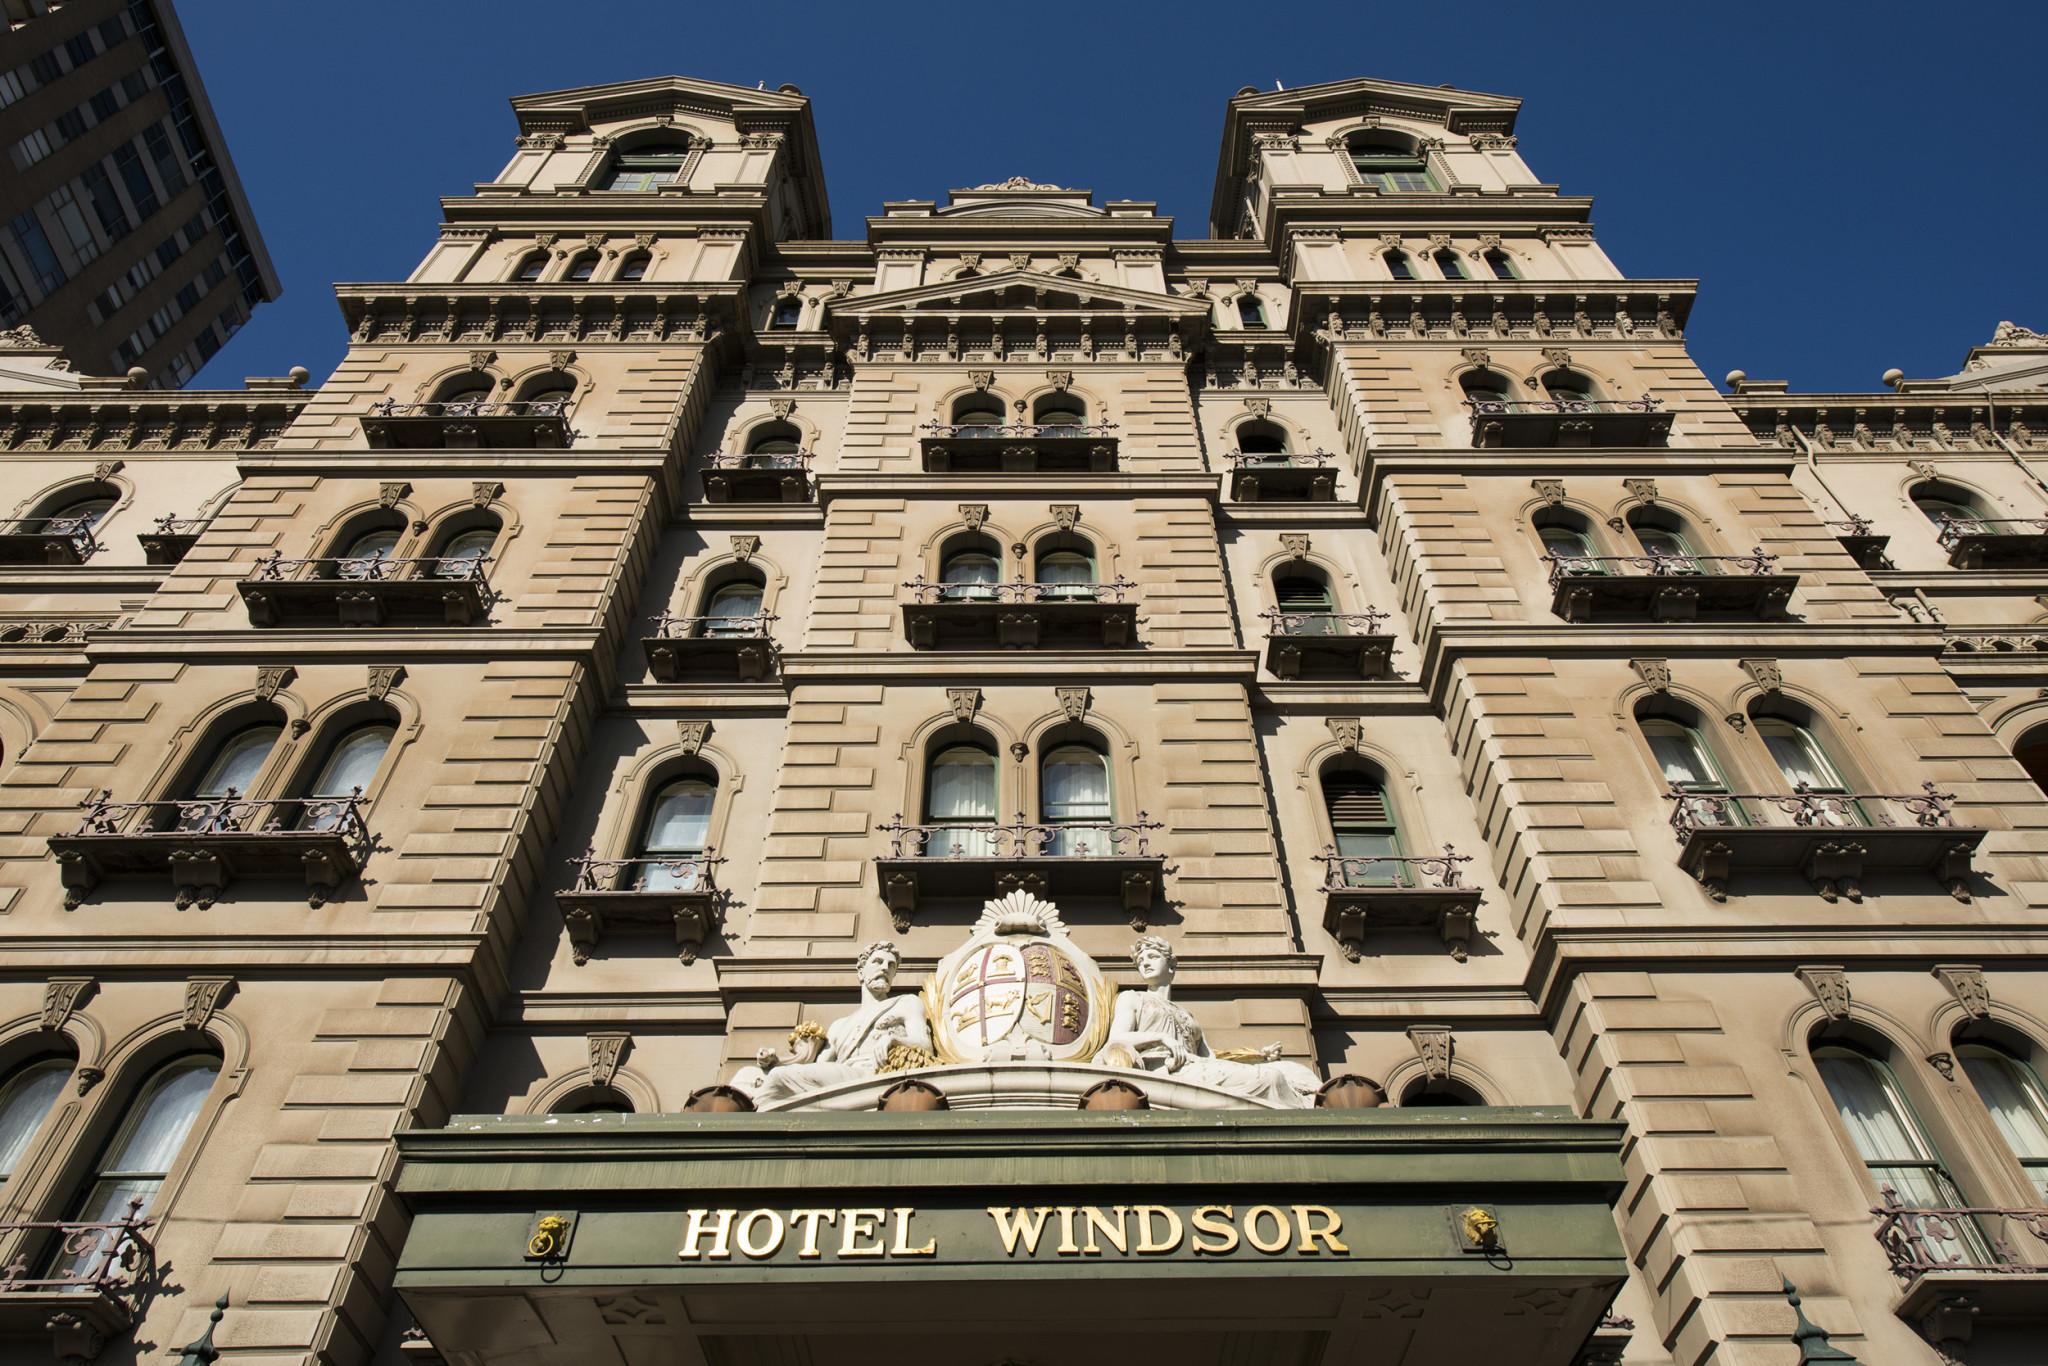 The Windsor Afternoon Tea